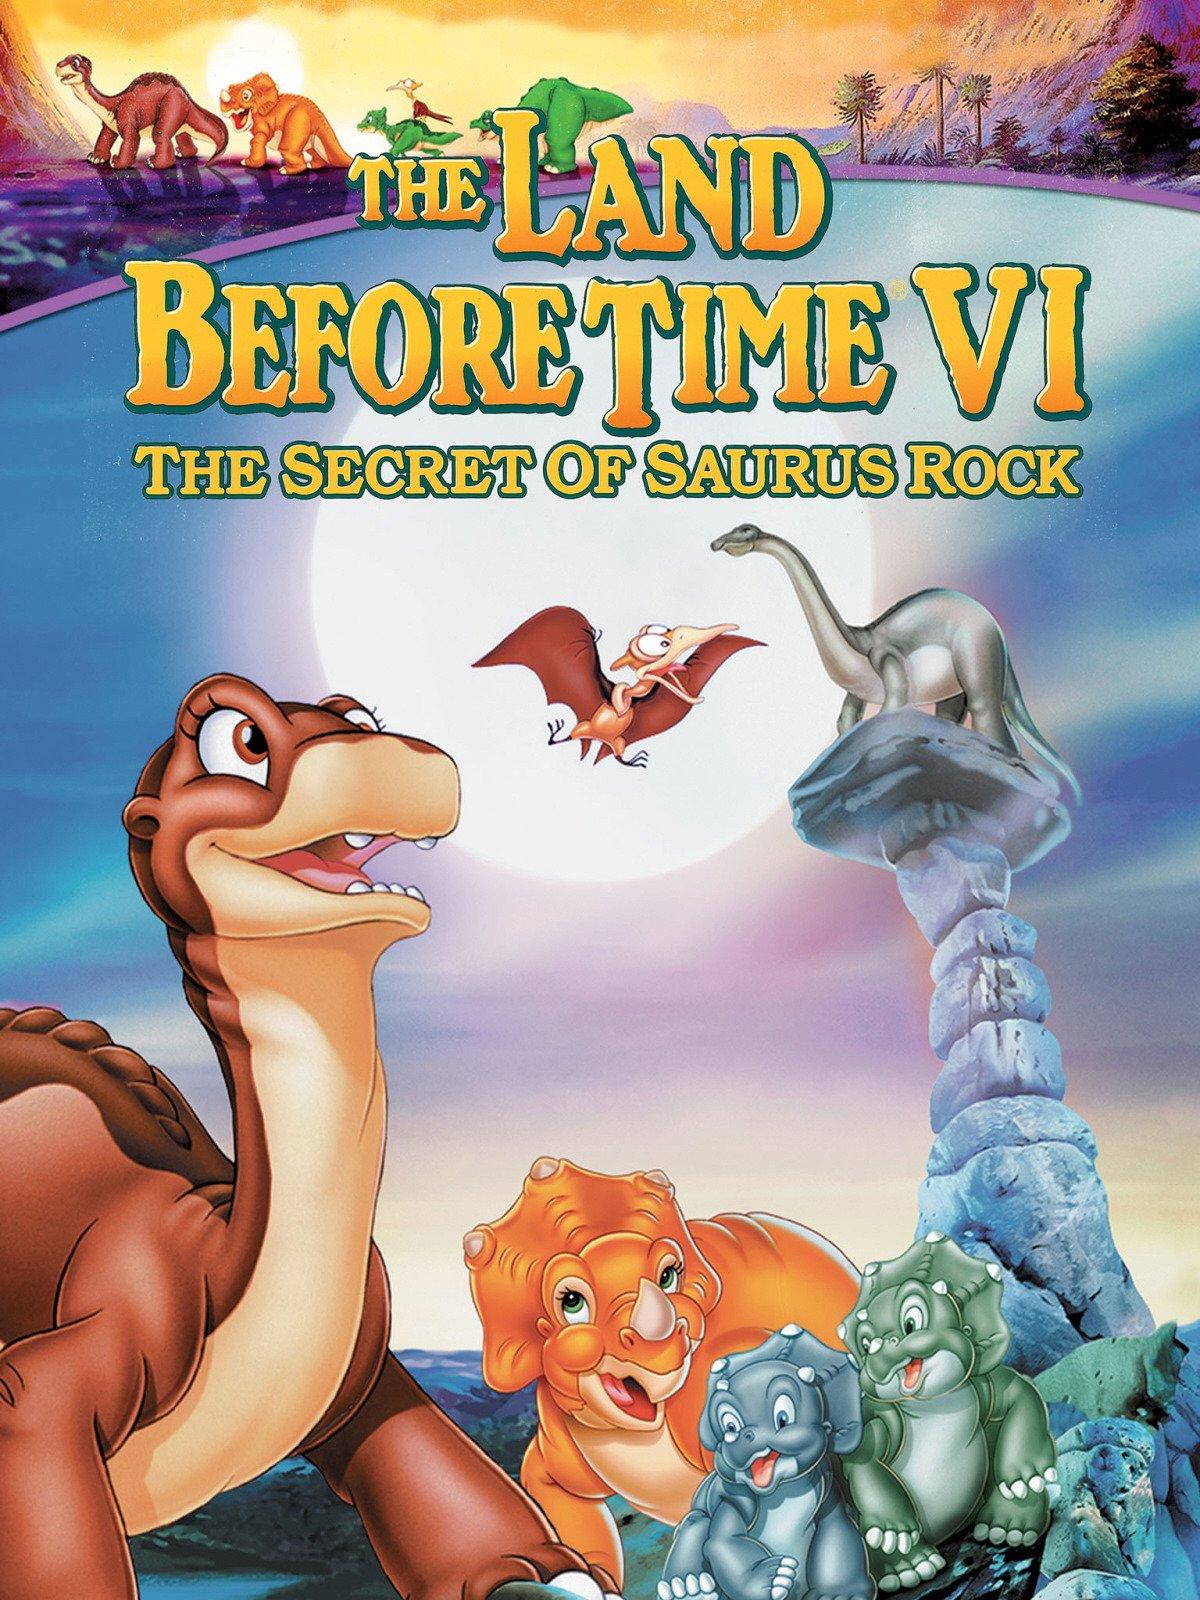 amazon com the land before time vi the secret of saurus rock